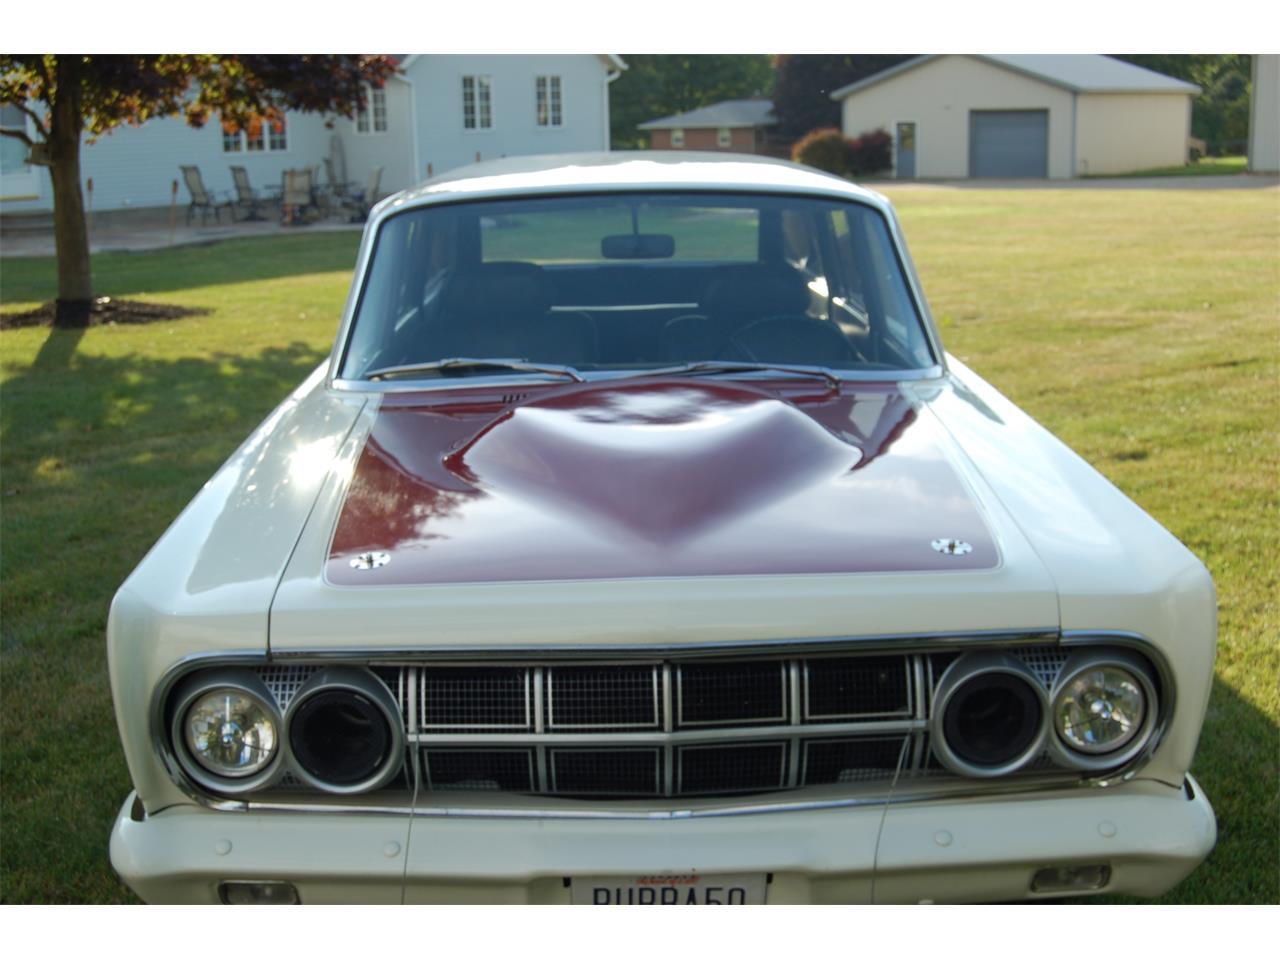 For Sale: 1964 Mercury Comet in Wooster, Ohio